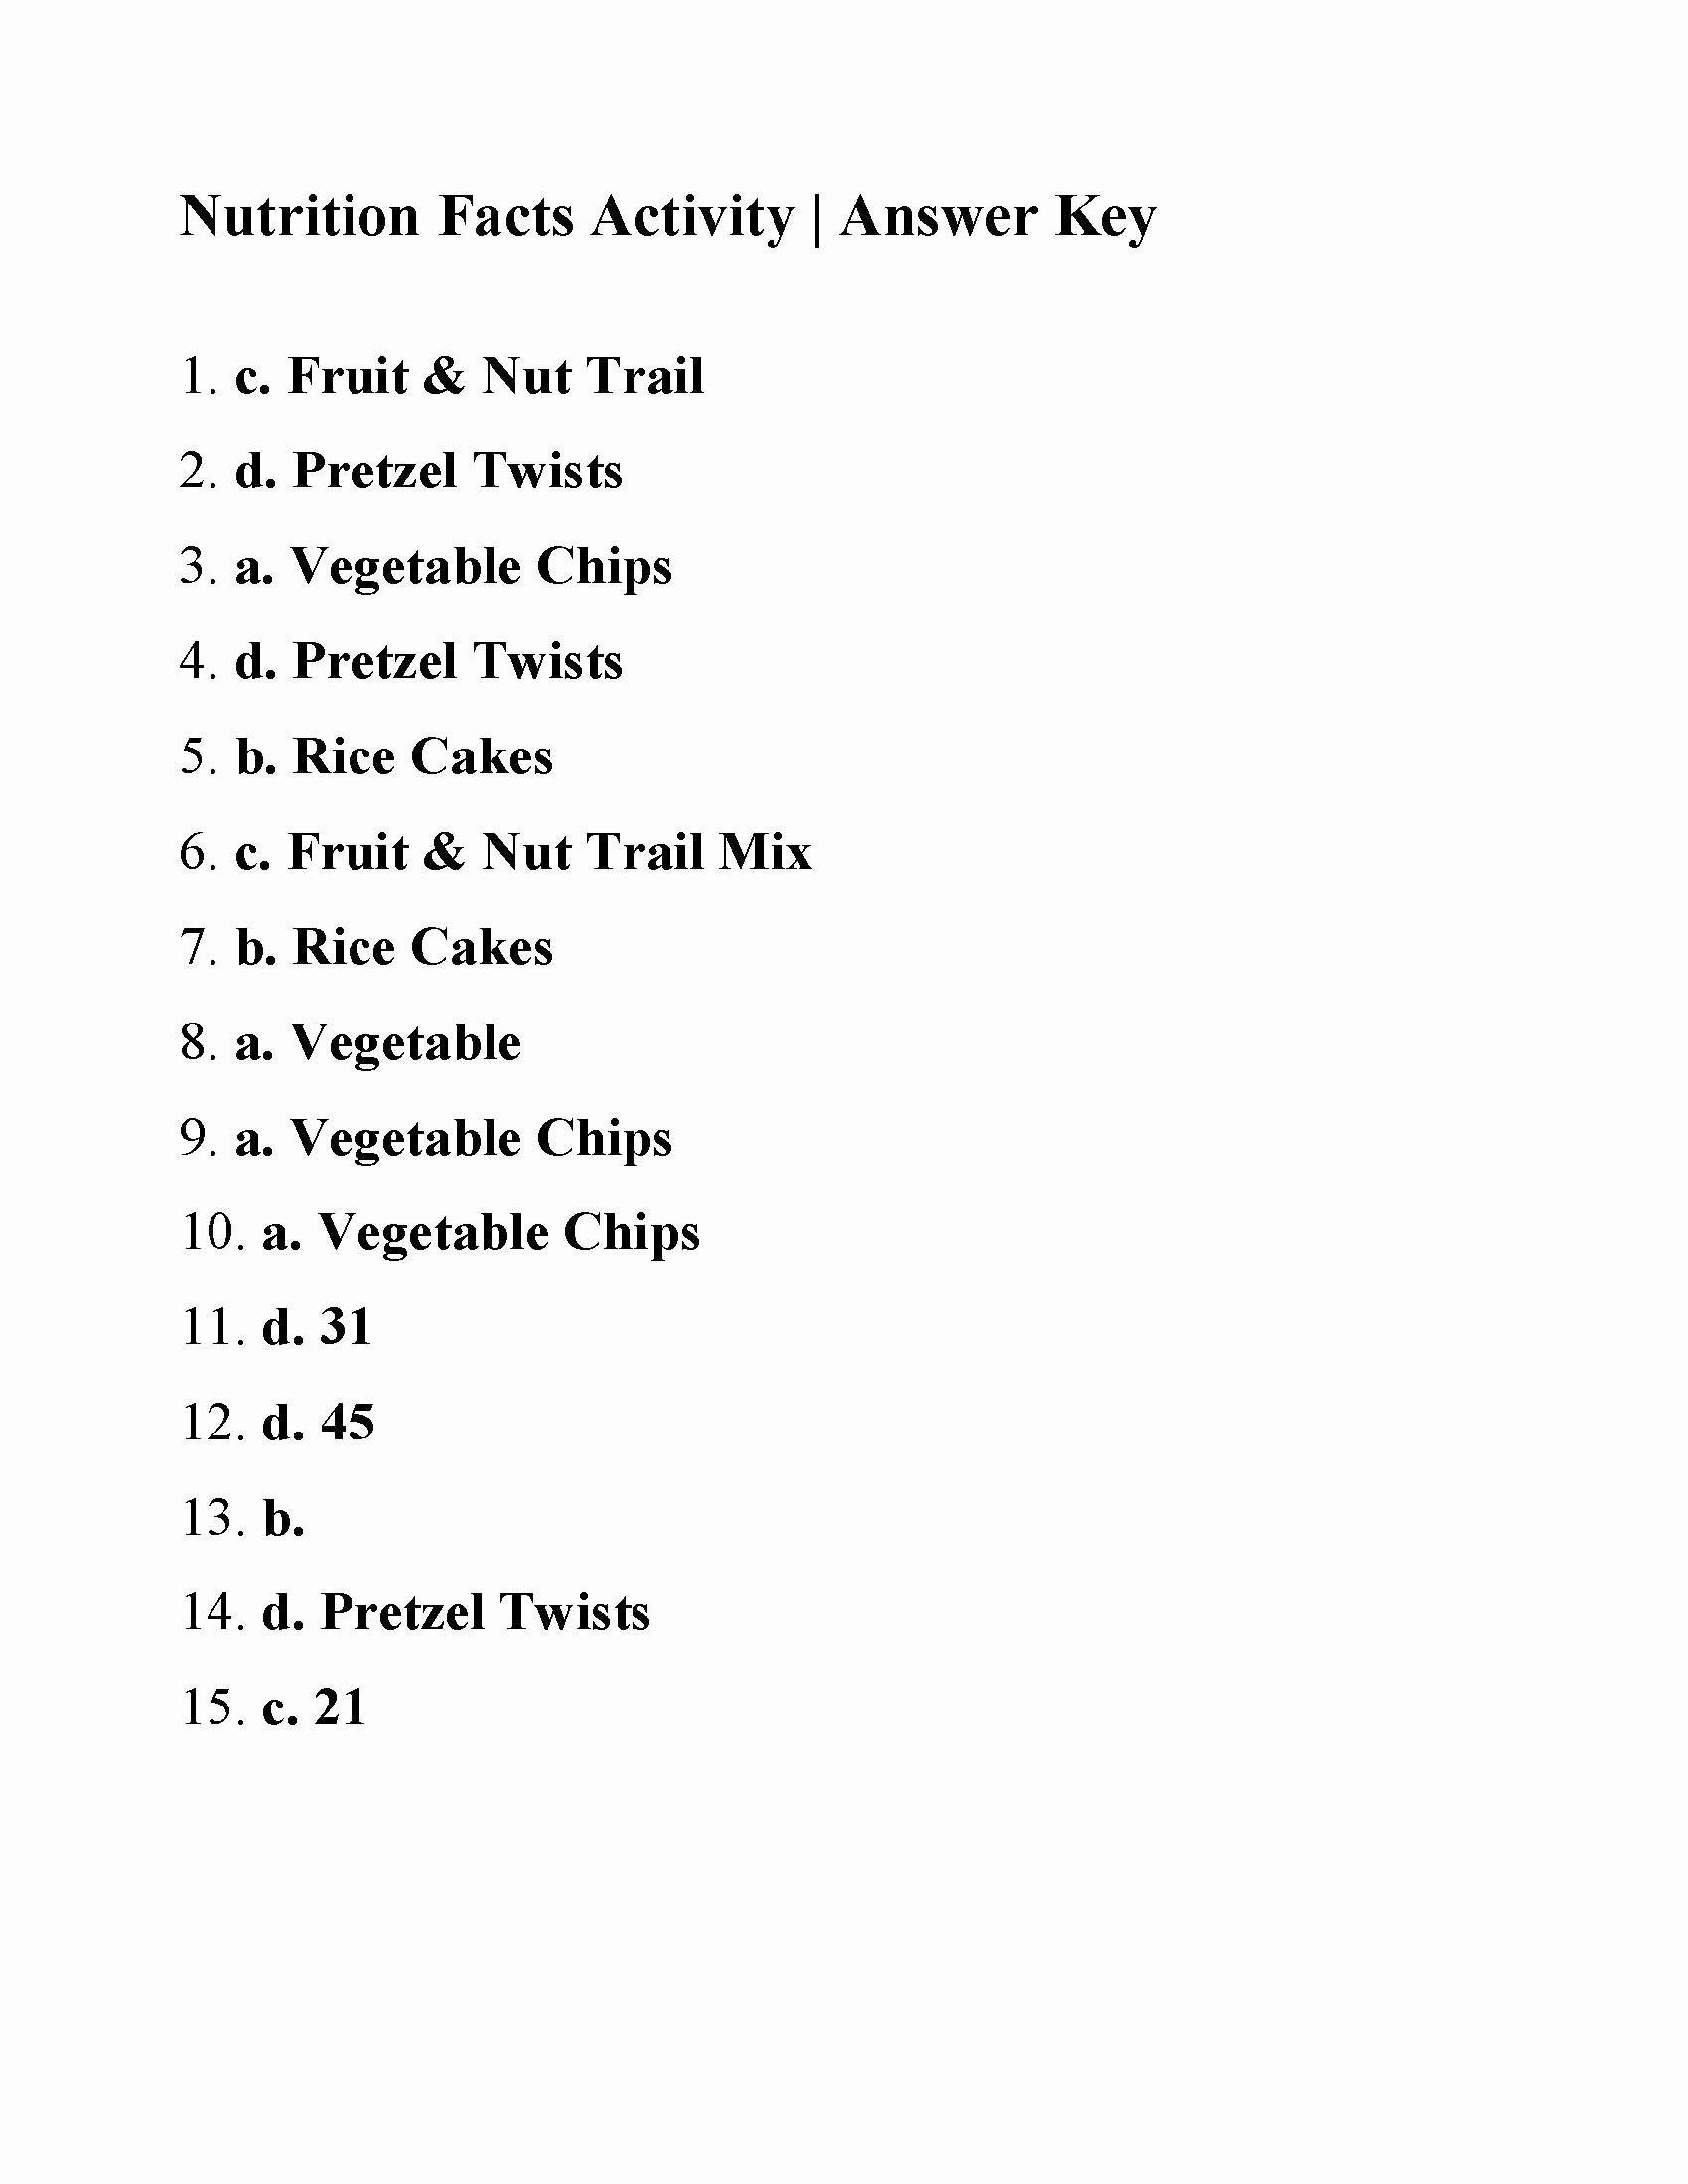 Nutrition Label Worksheet Answer Key Elegant Nutrition Reading Prehension Worksheets In 2020 Persuasive Writing Prompts Chemistry Worksheets Kids Worksheets Printables